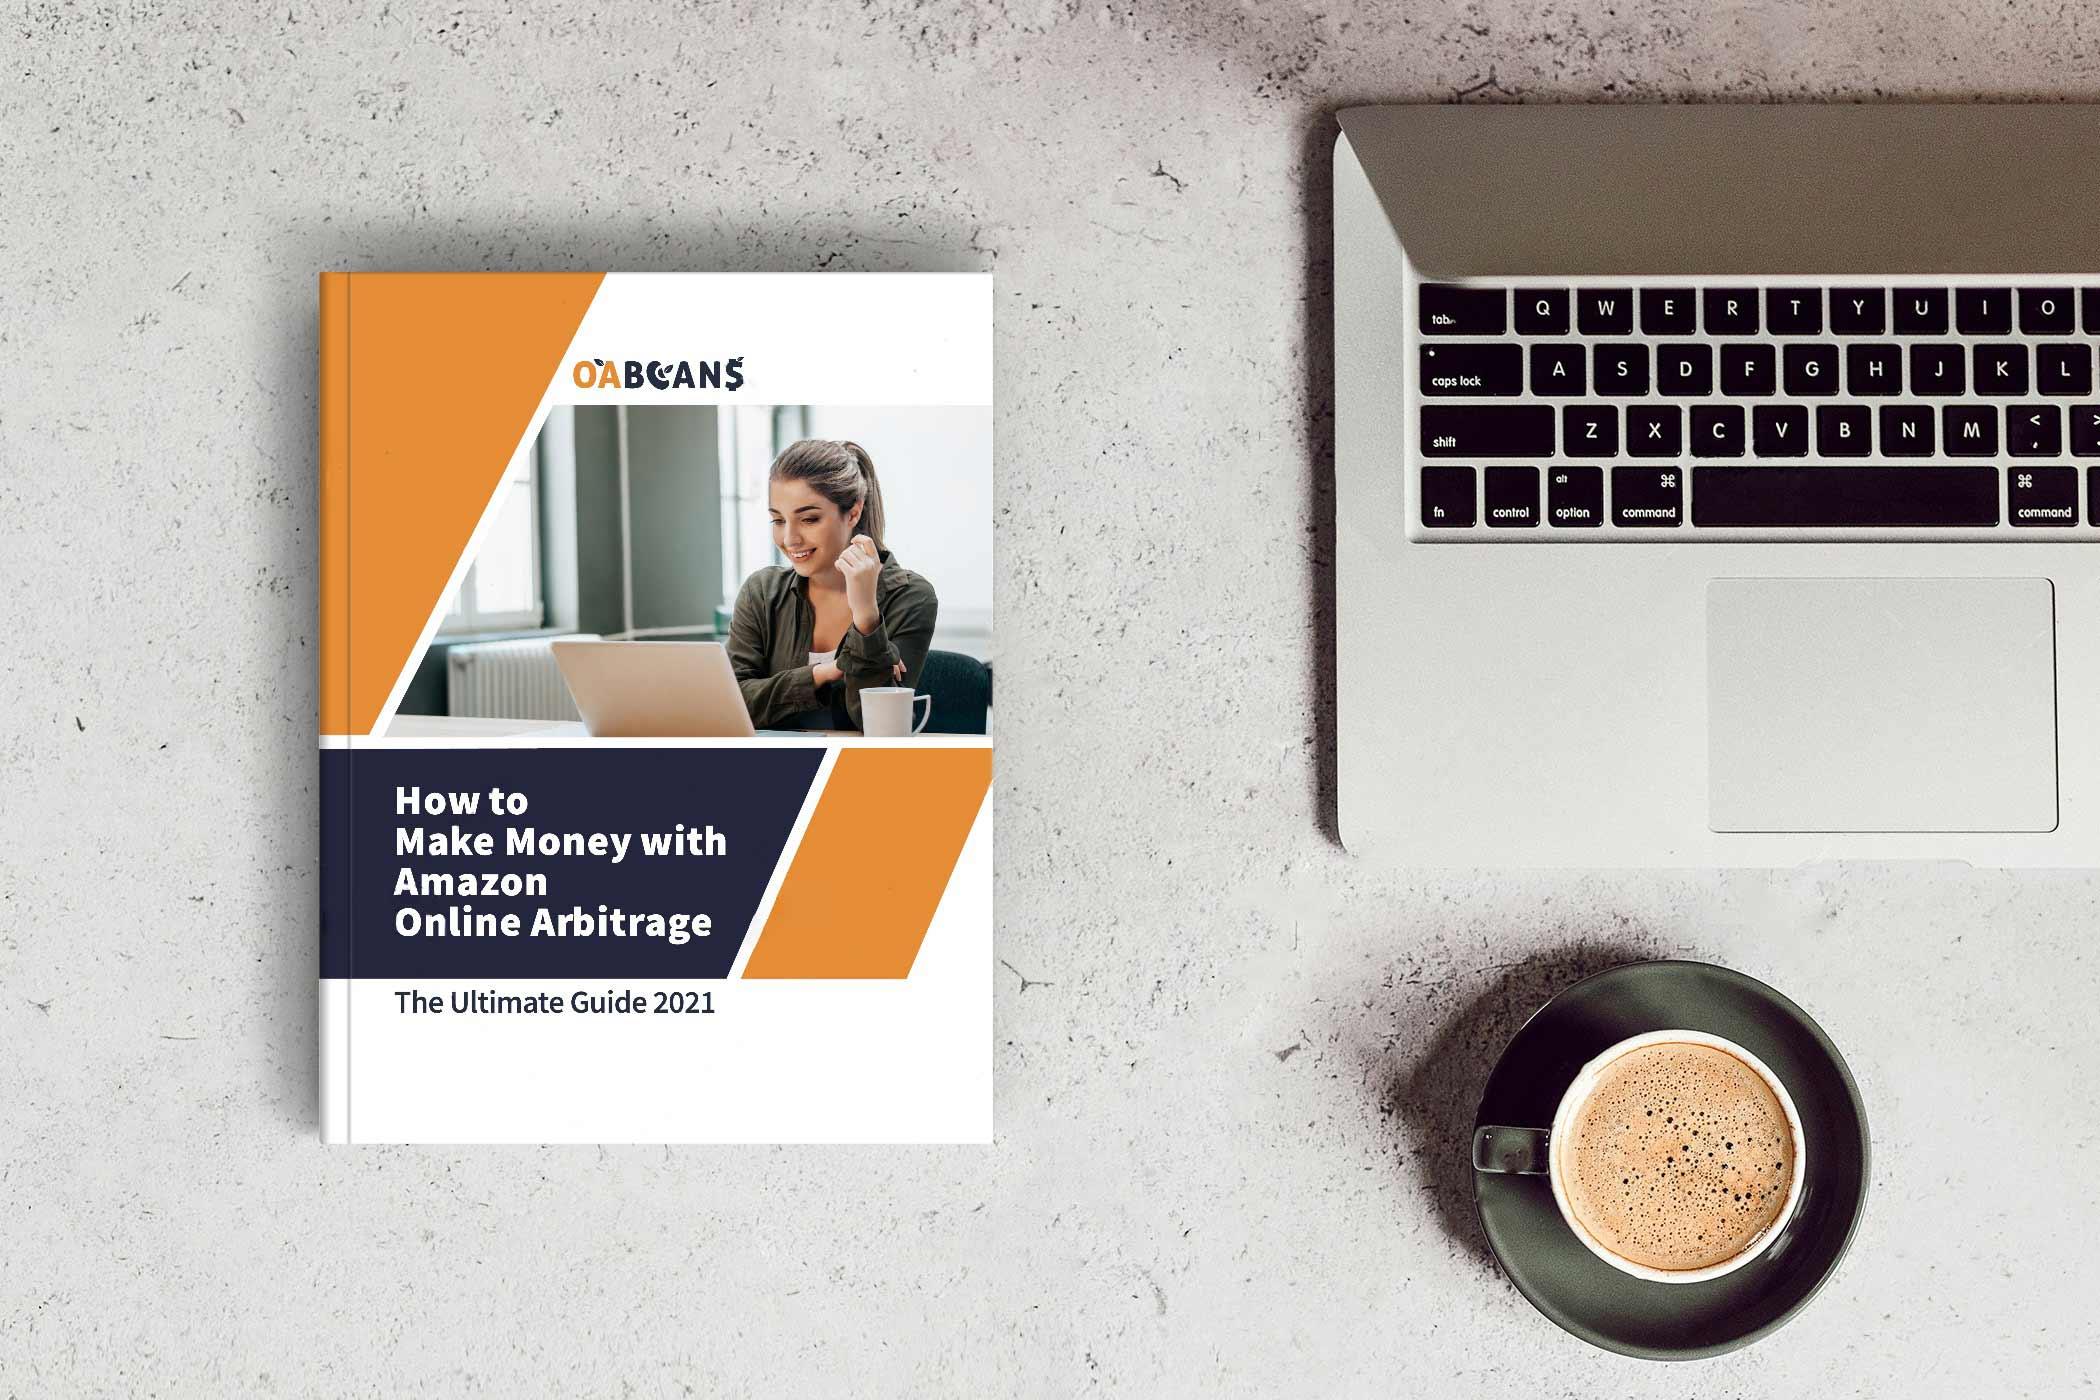 online arbitrage ultimate guide book